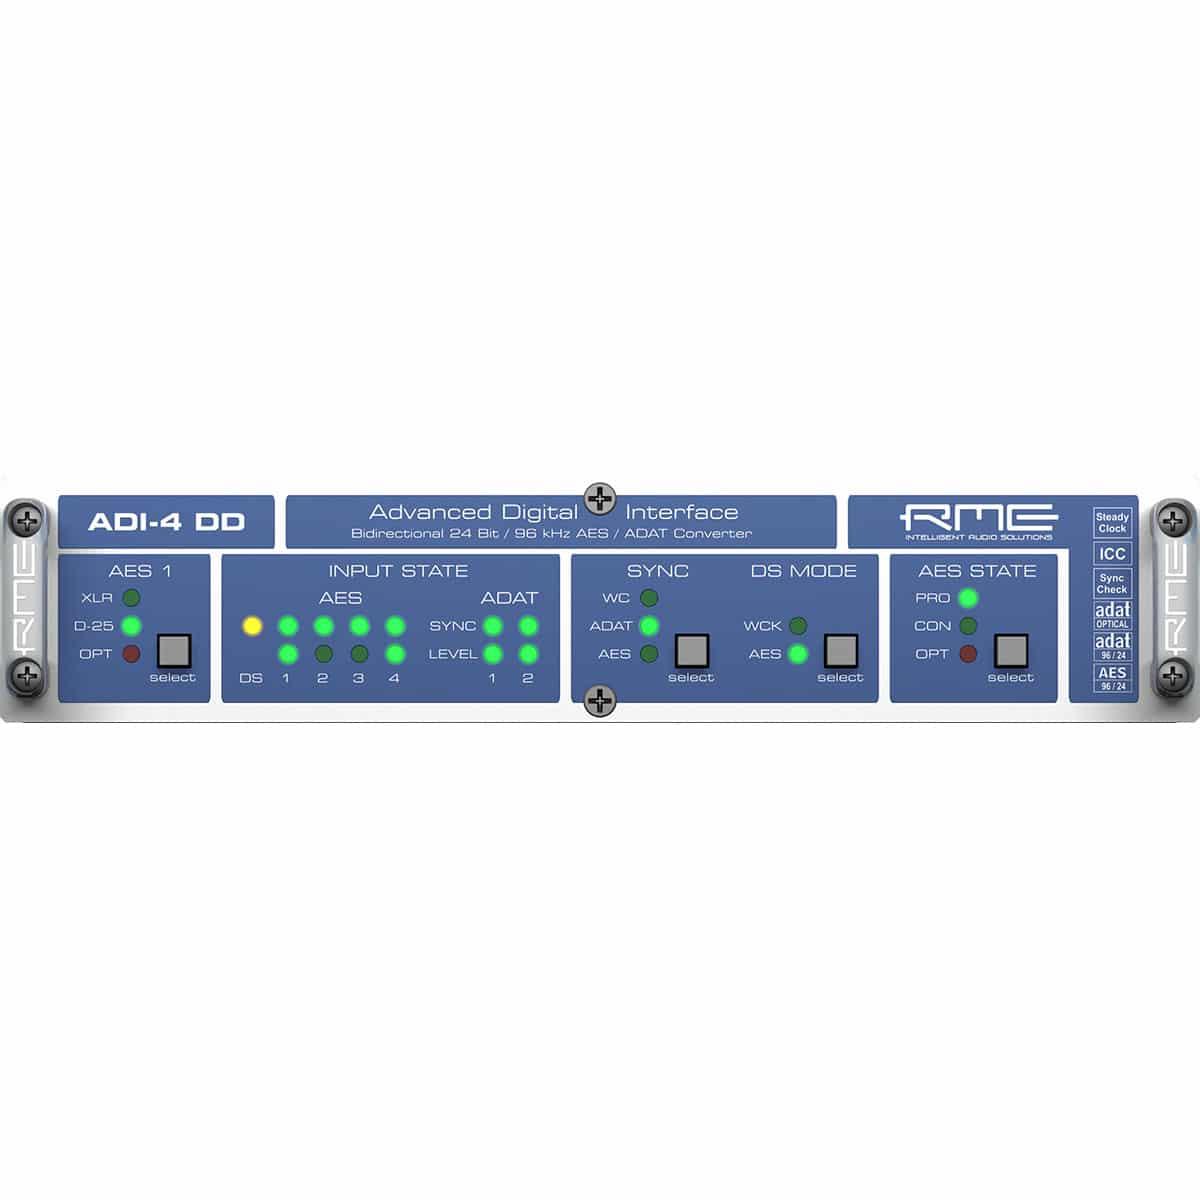 RME ADI 4 DD 04 Convertitori Audio, Pro Audio, Audio Digitale